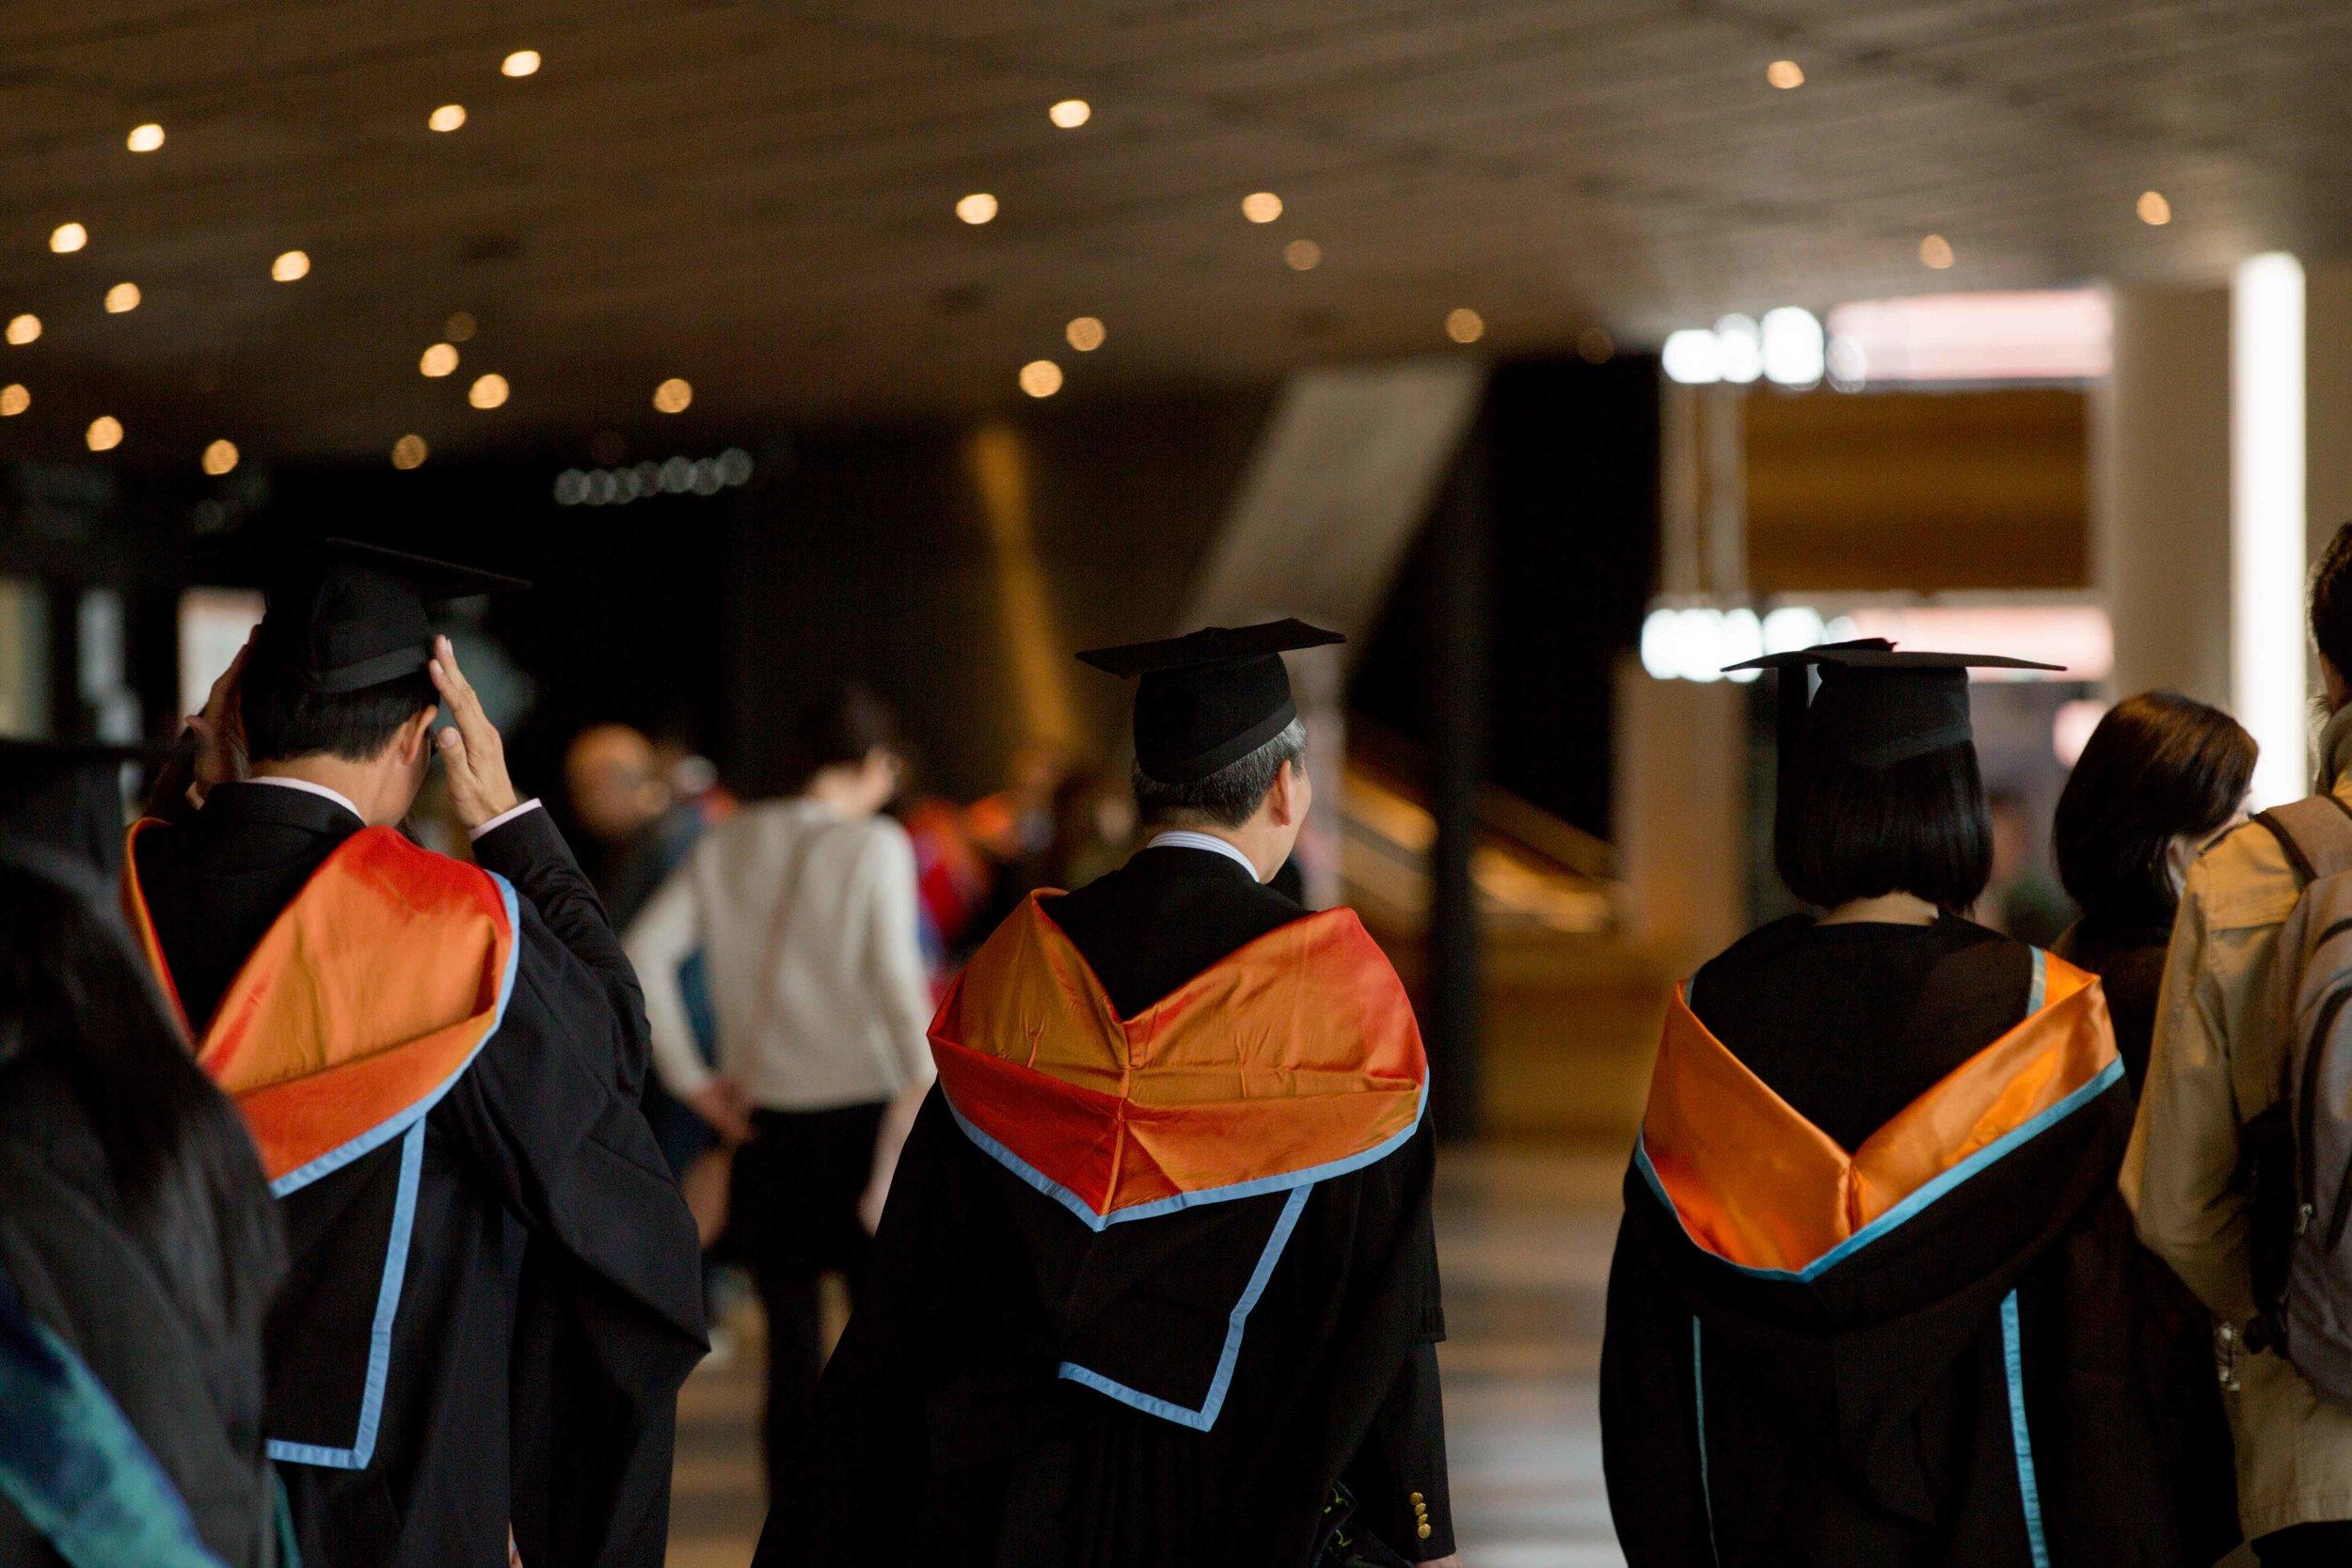 Arden-university-graduation-commercial-photographer-cardiff-natalia-smith-photography-18.jpg